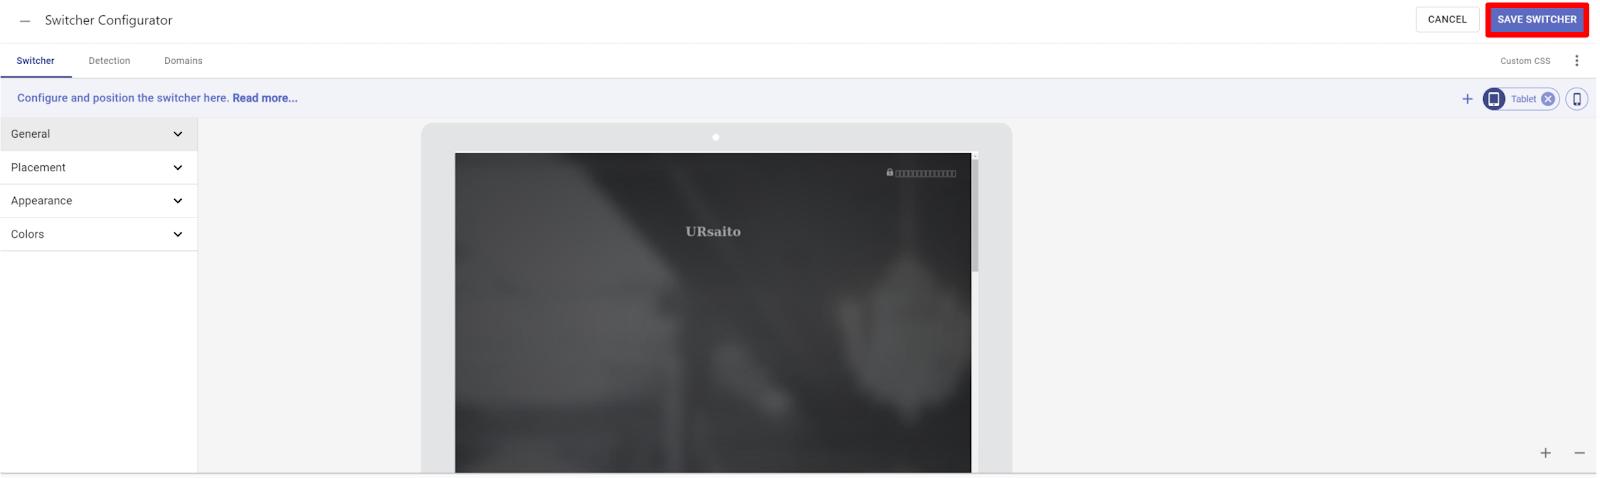 Switcher登録画像